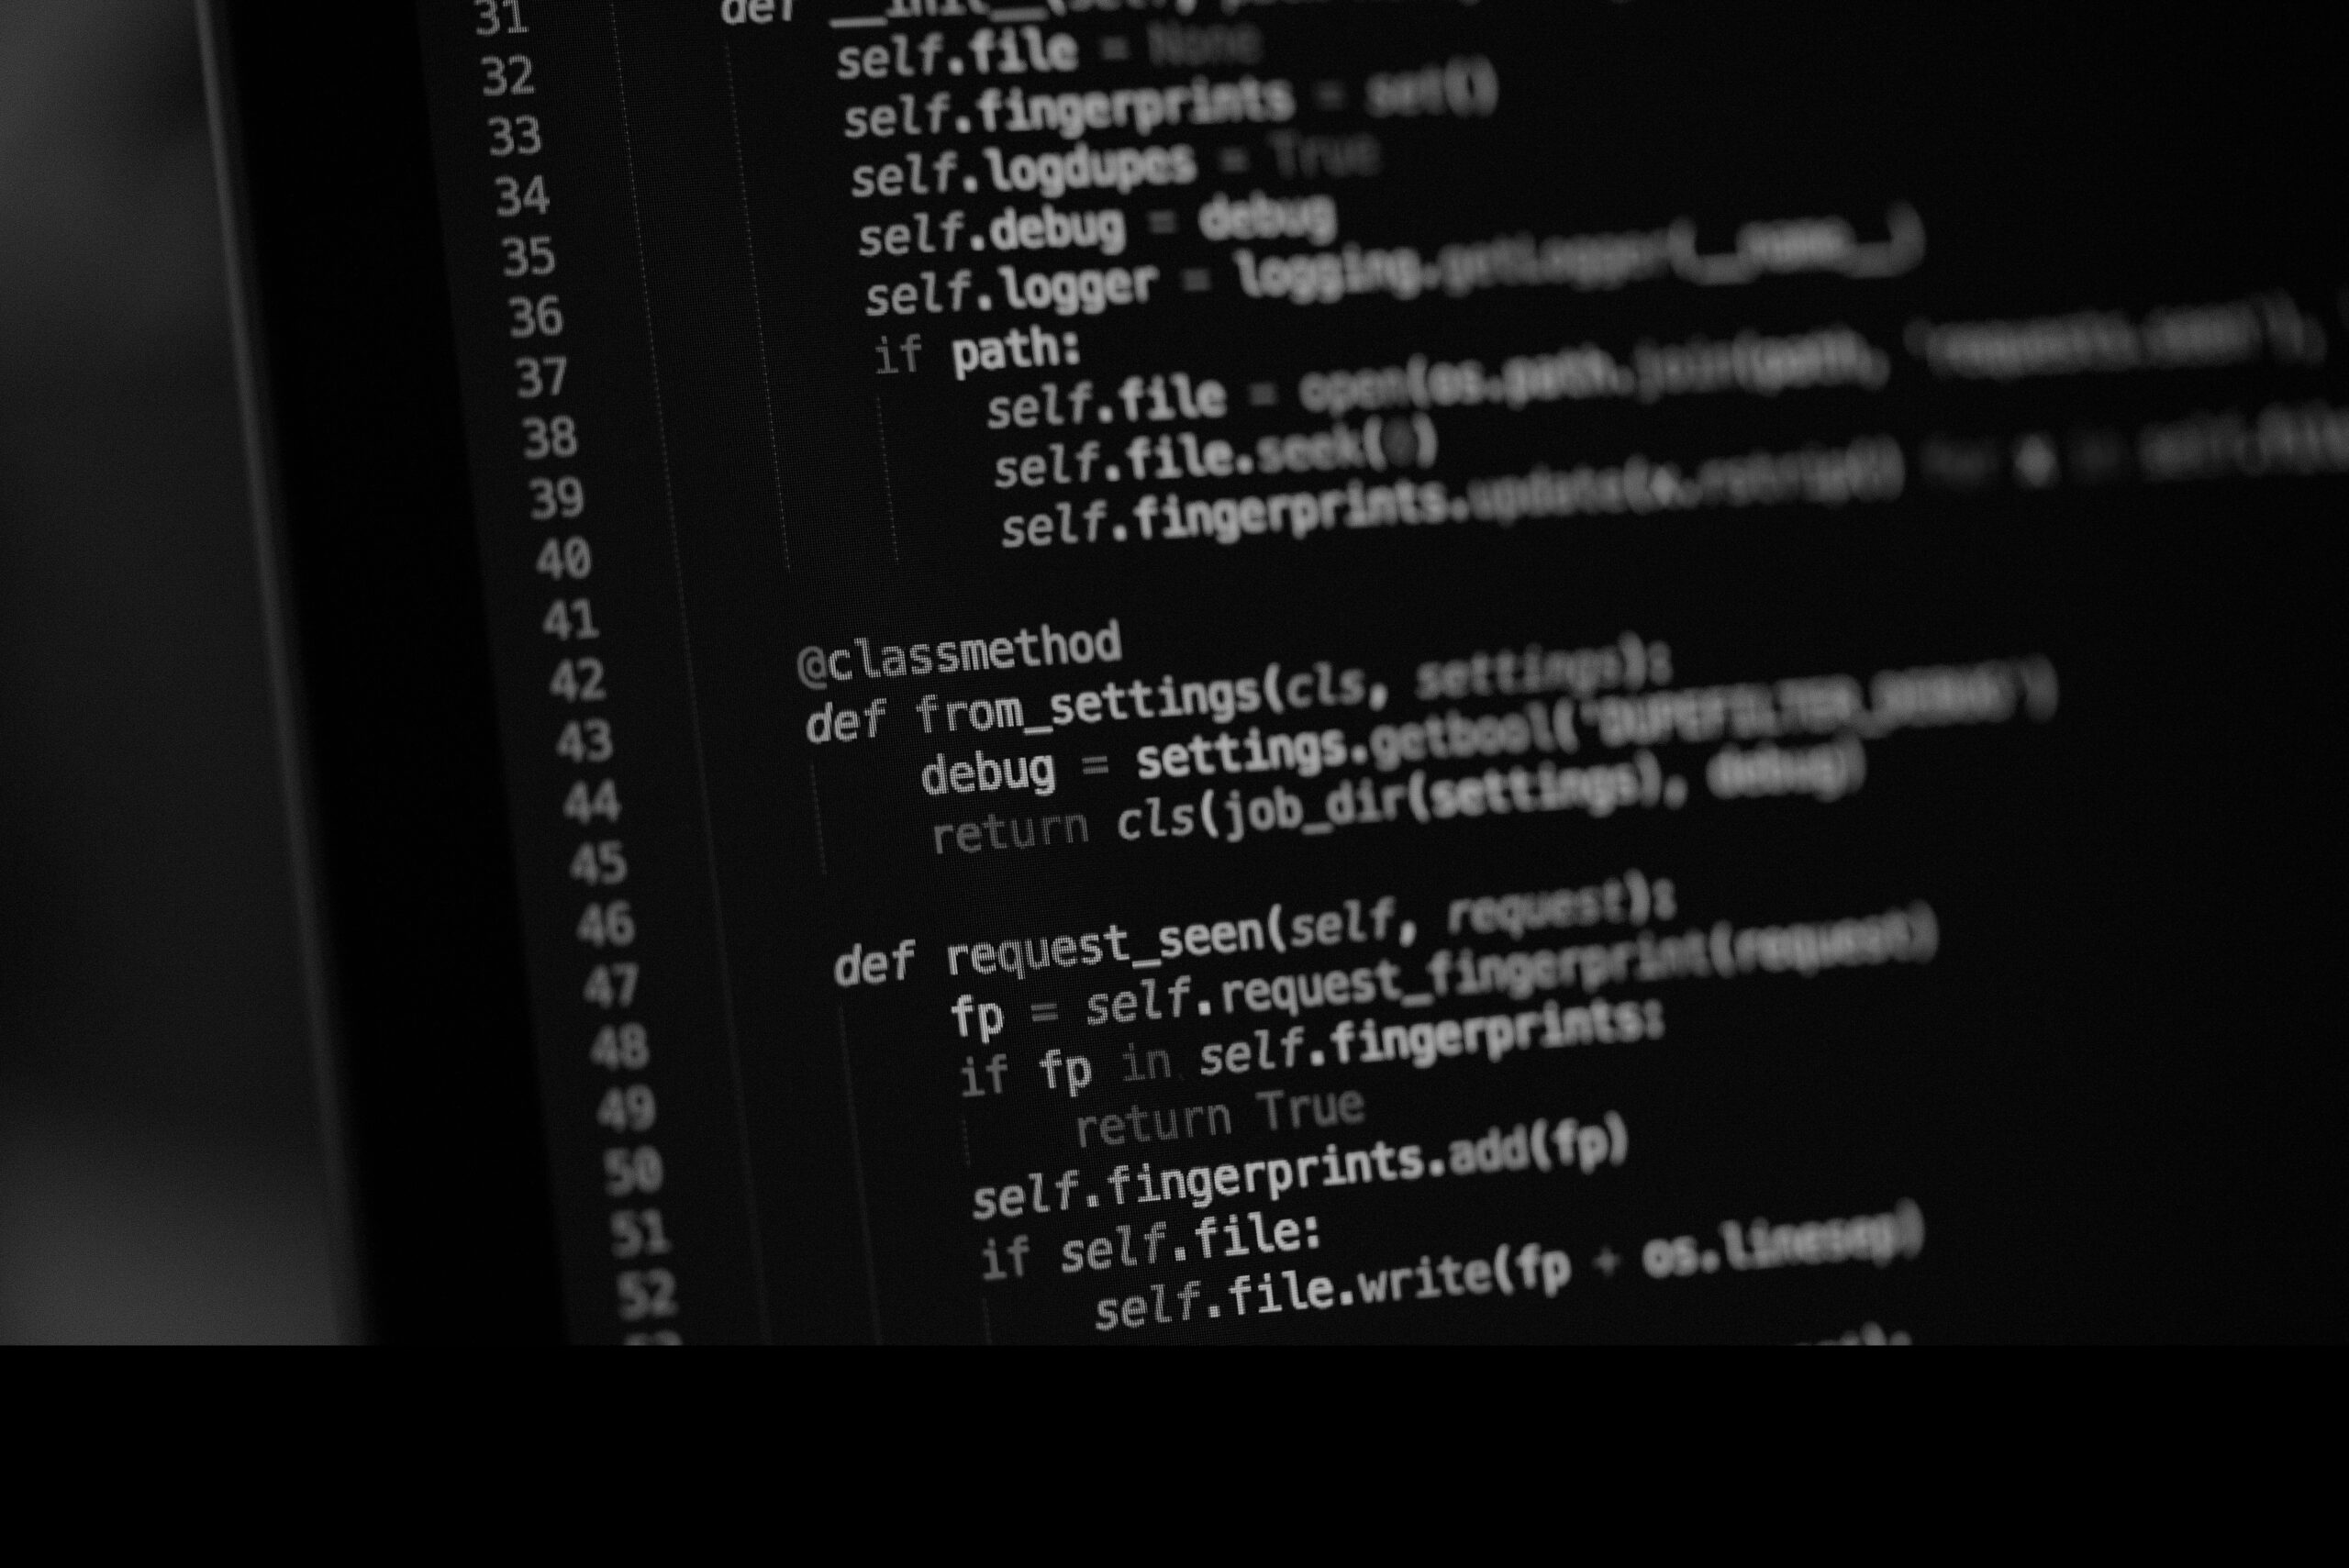 Kethik: Die Ethik der Algorithmen